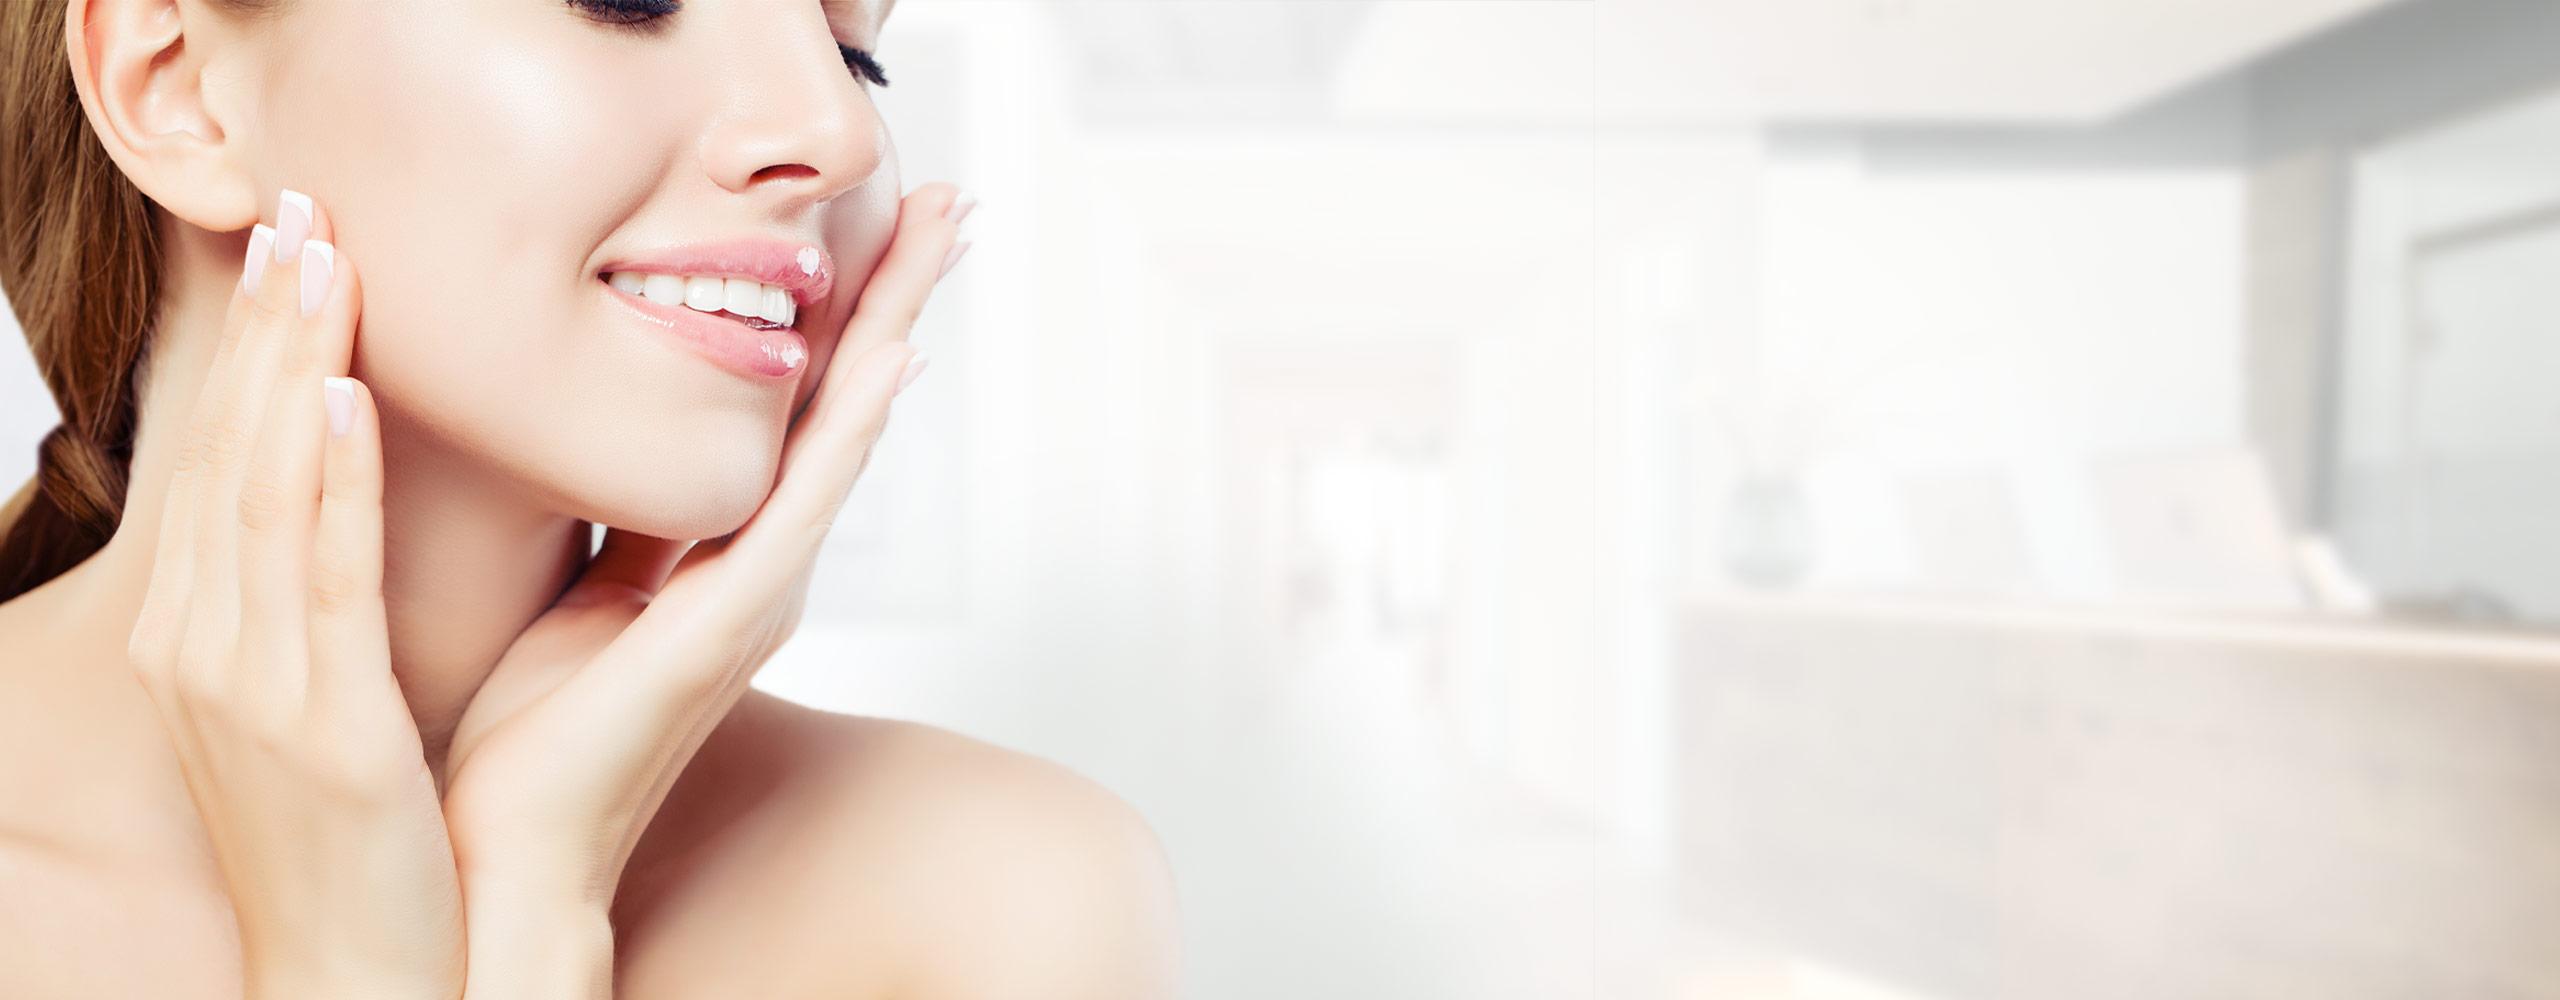 zahn zaehne bleaching veneers zahnimplantate proaesthetic header